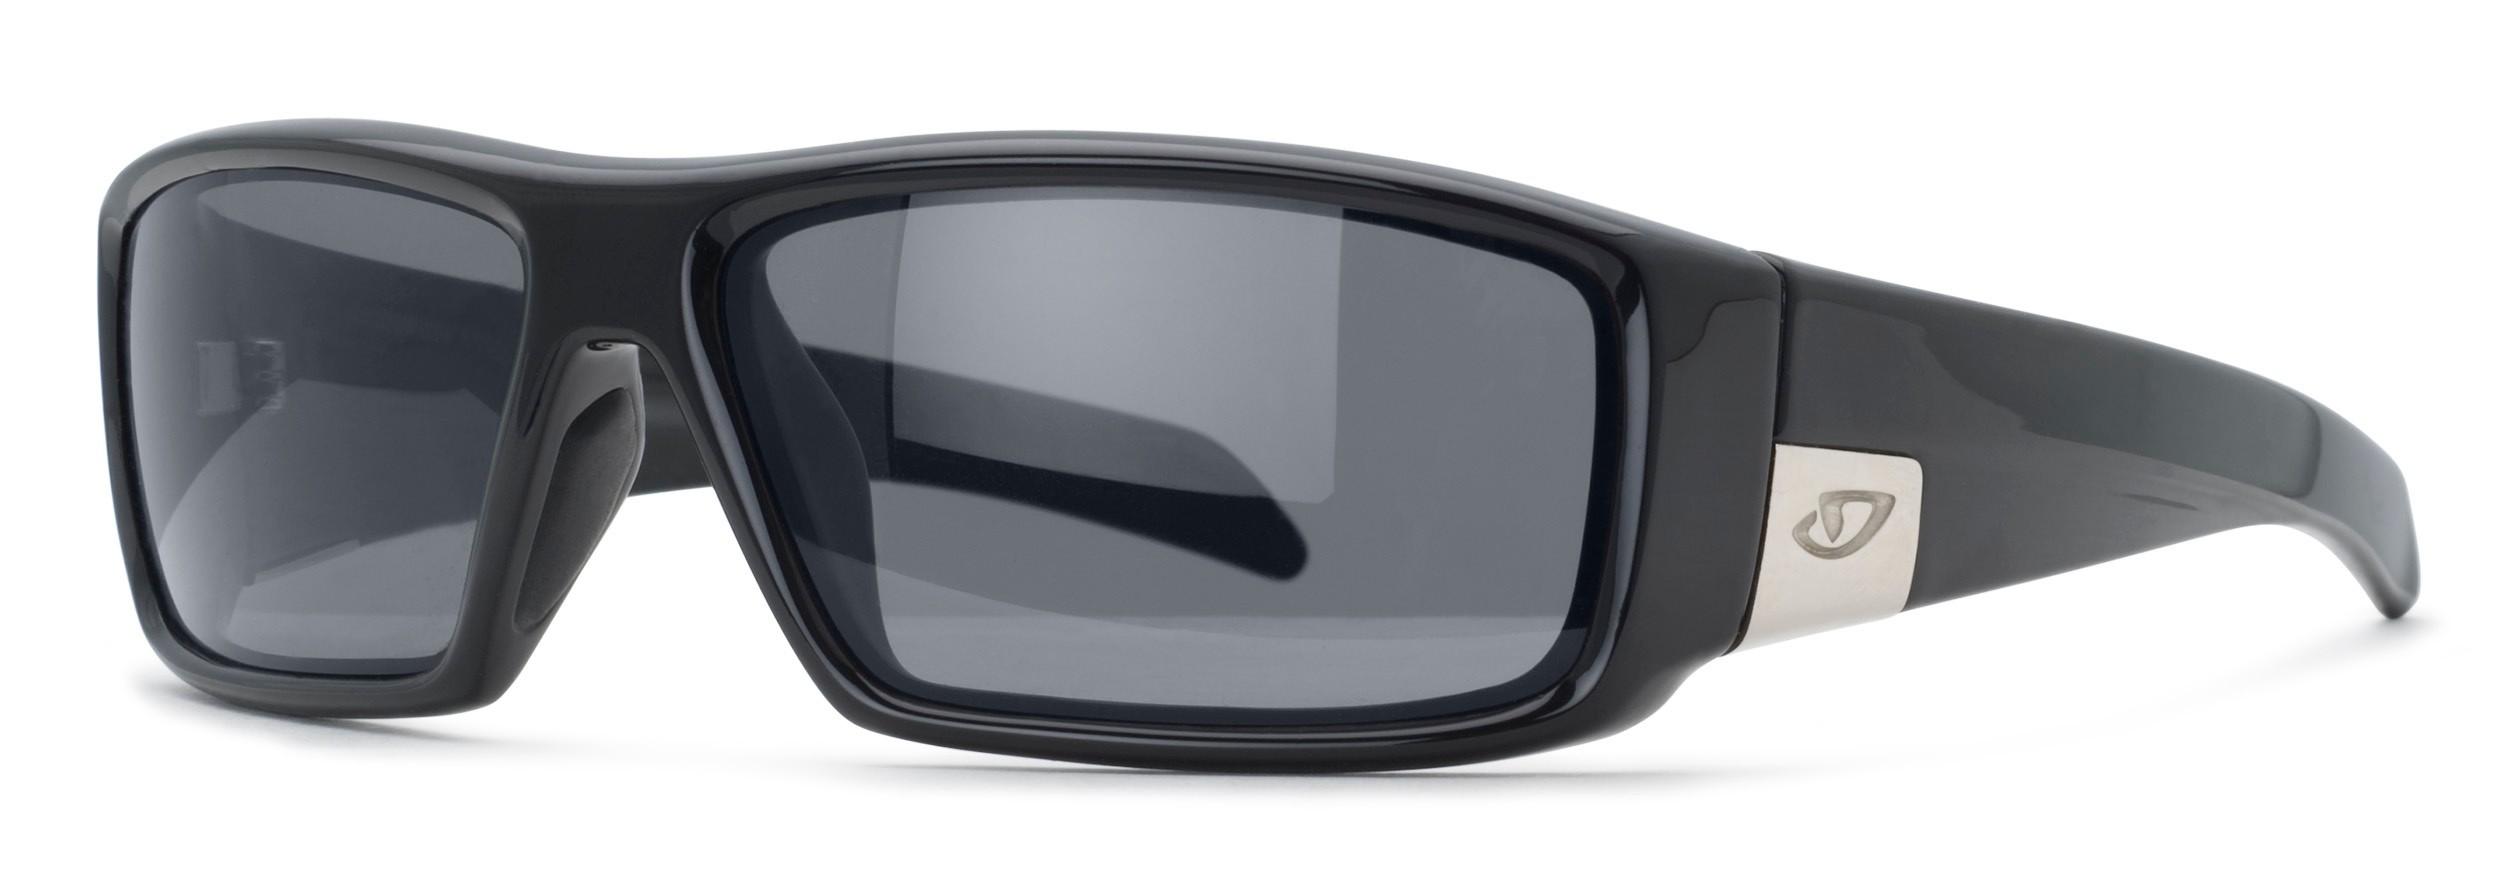 The 2009 Giro Fader lifestyle glasses.